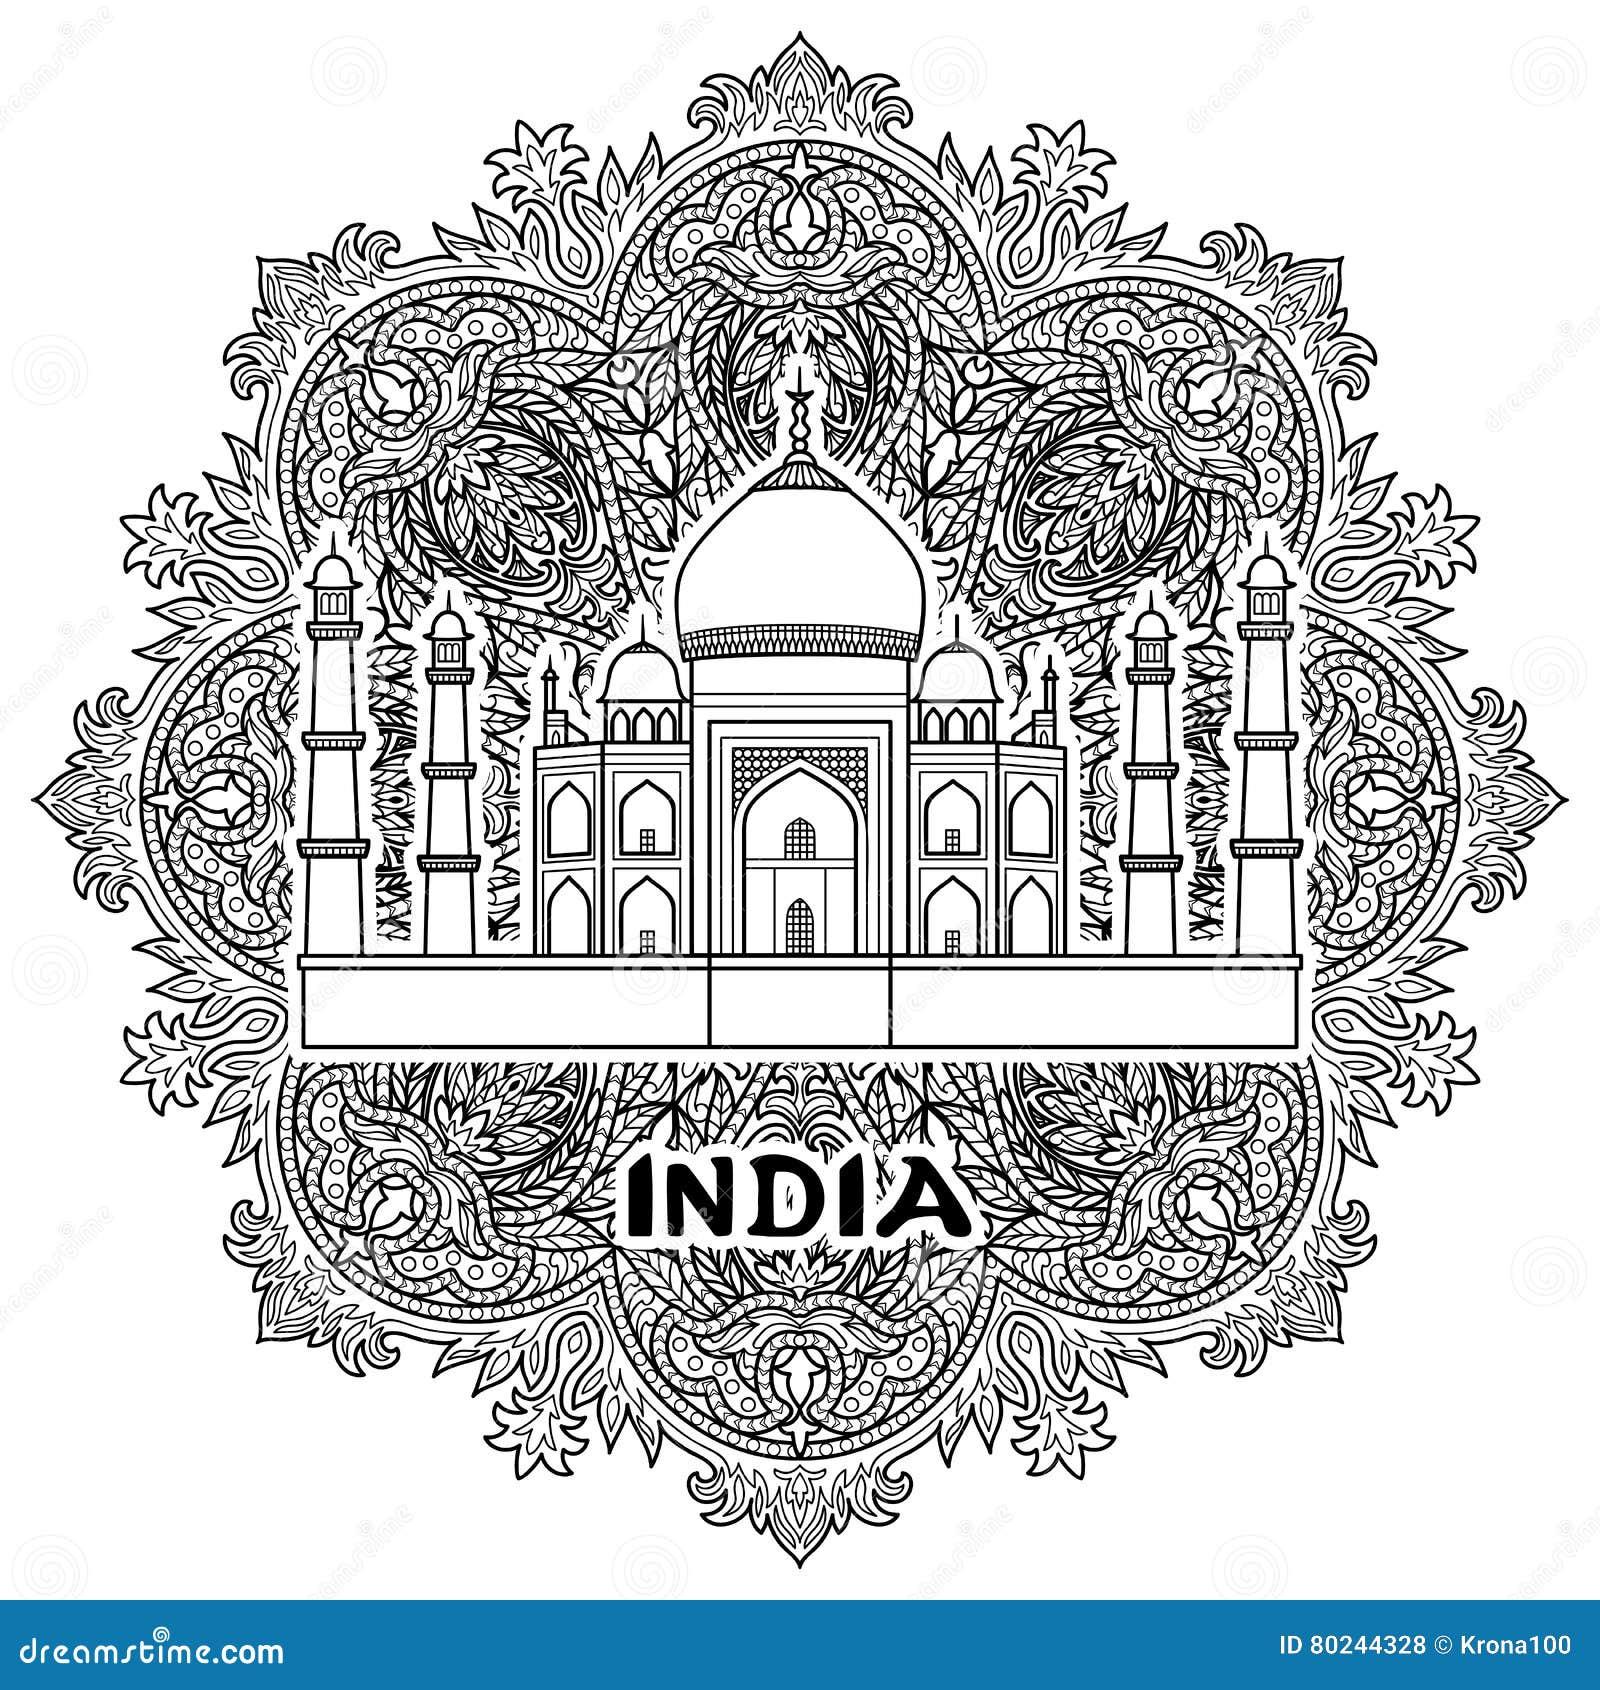 India Taj Mahal stock vector. Illustration of landmark - 80244328